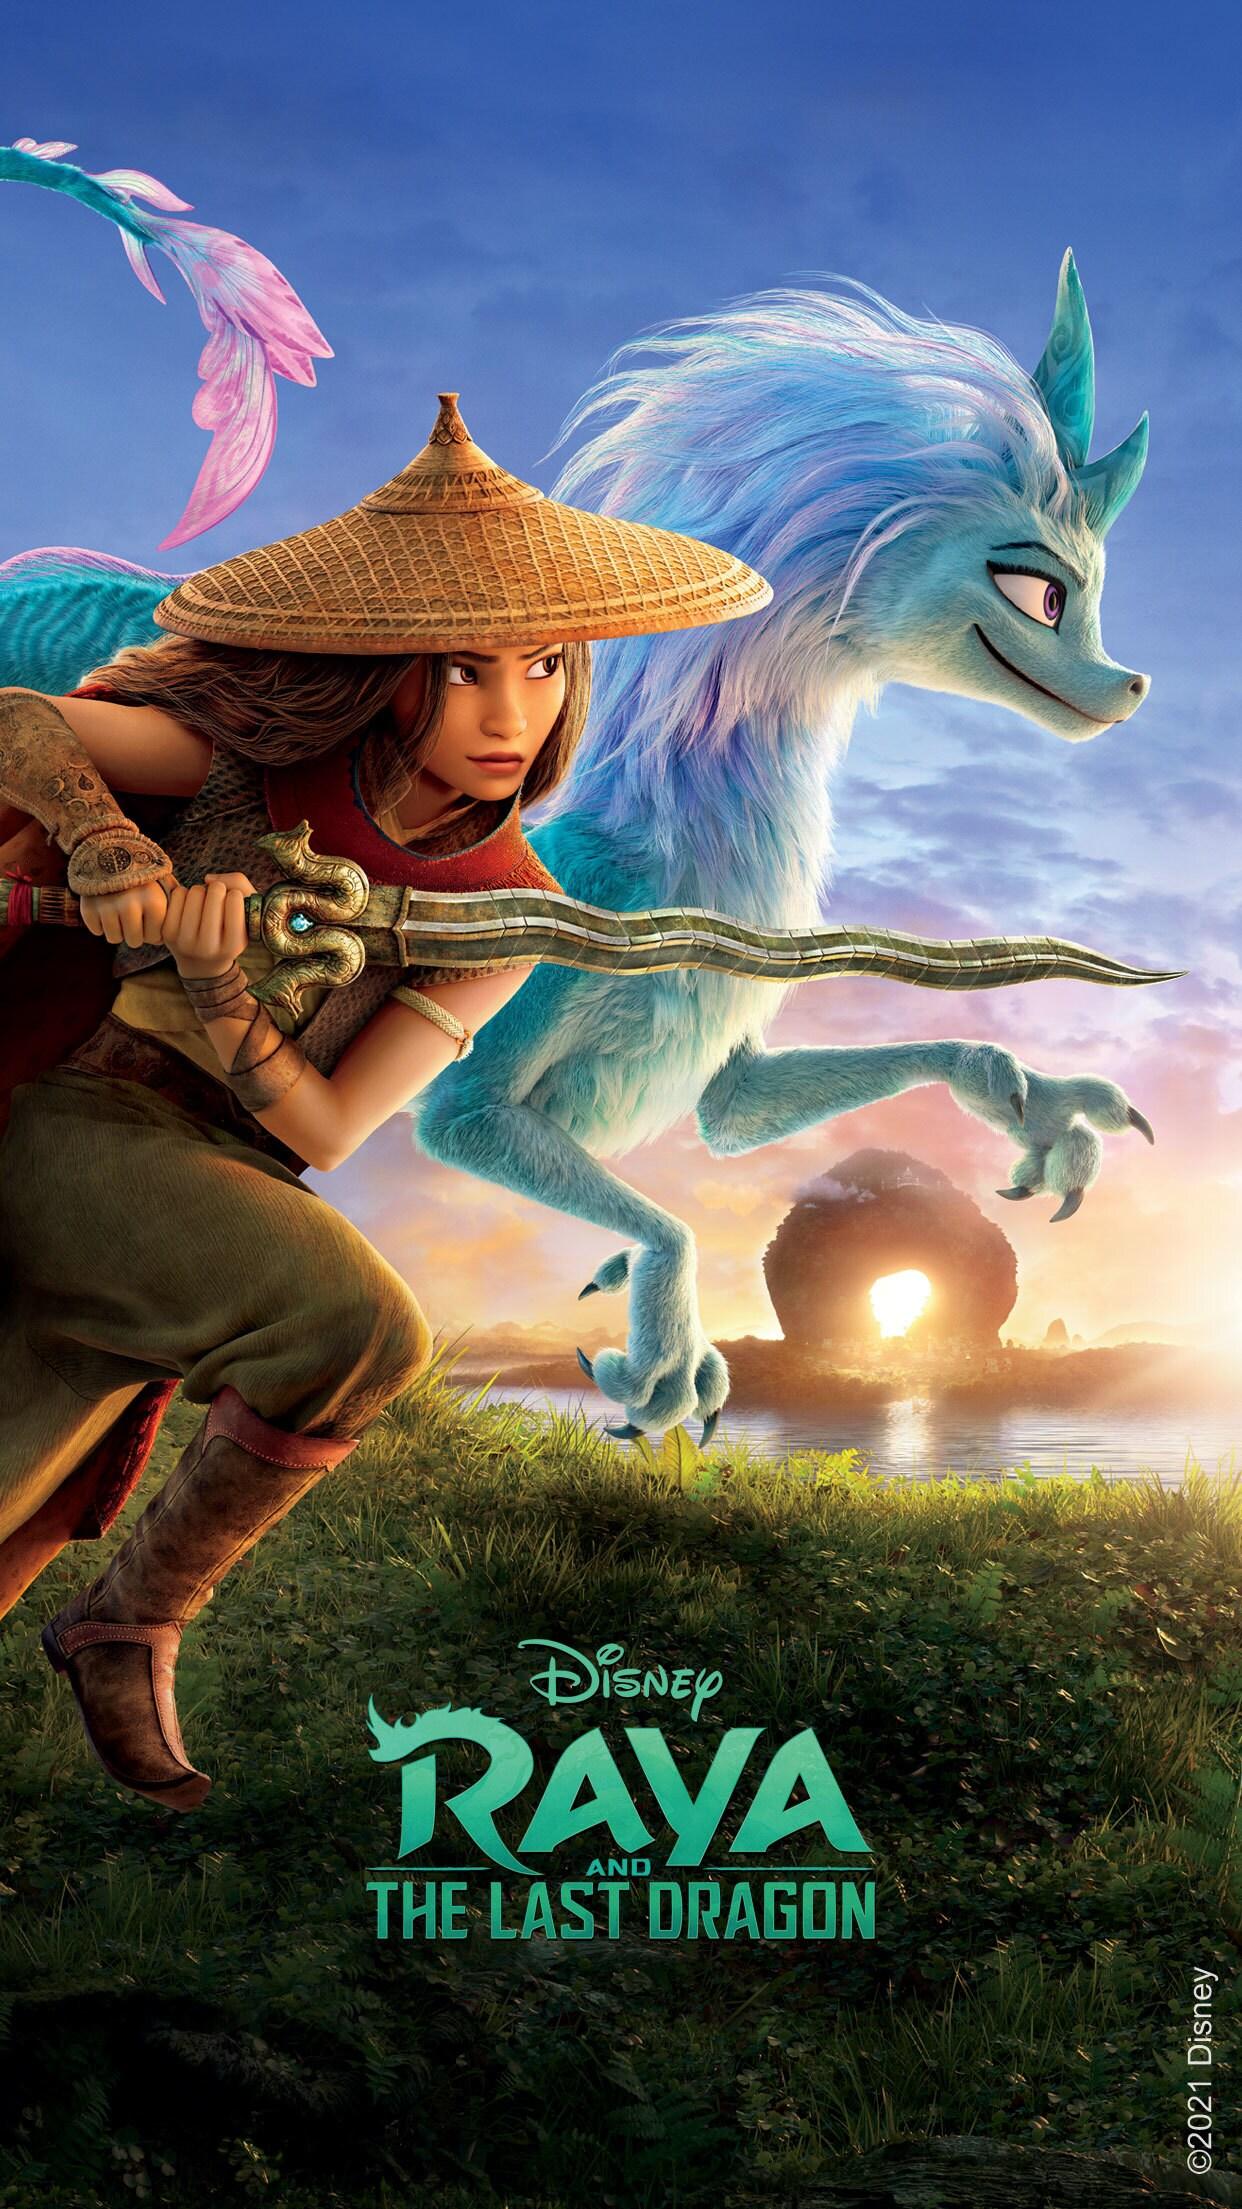 Disney's Raya and the Last Dragon